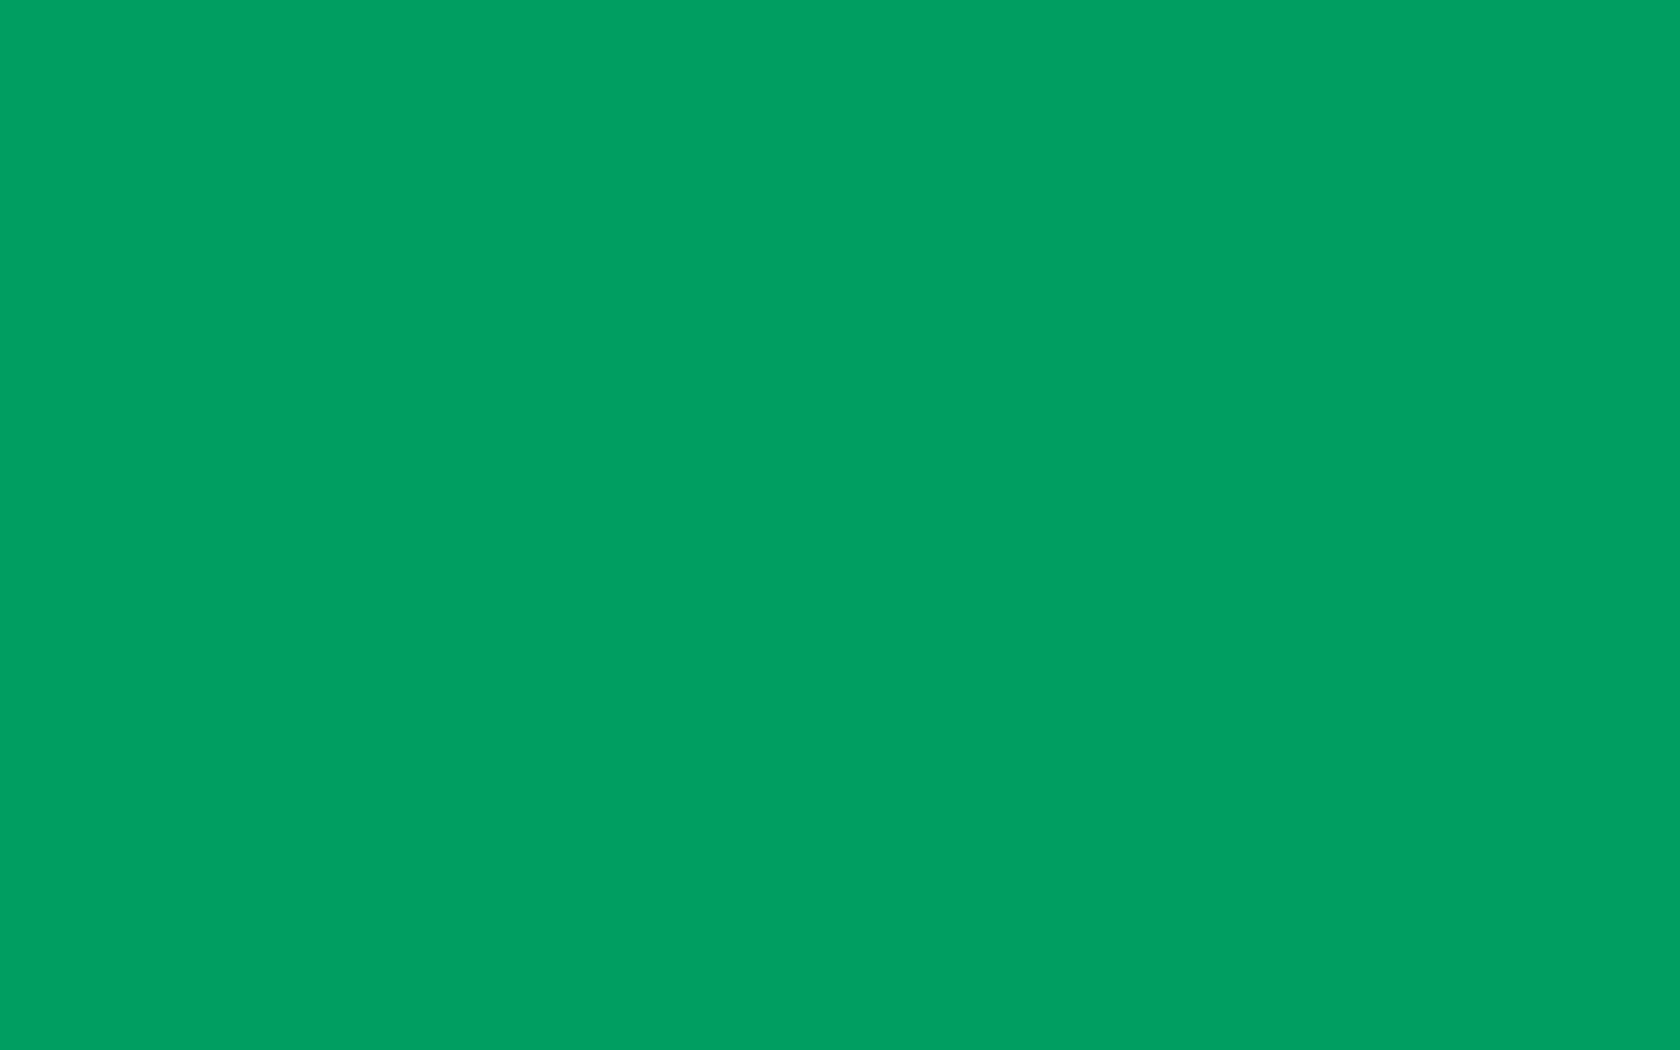 1680x1050 Shamrock Green Solid Color Background